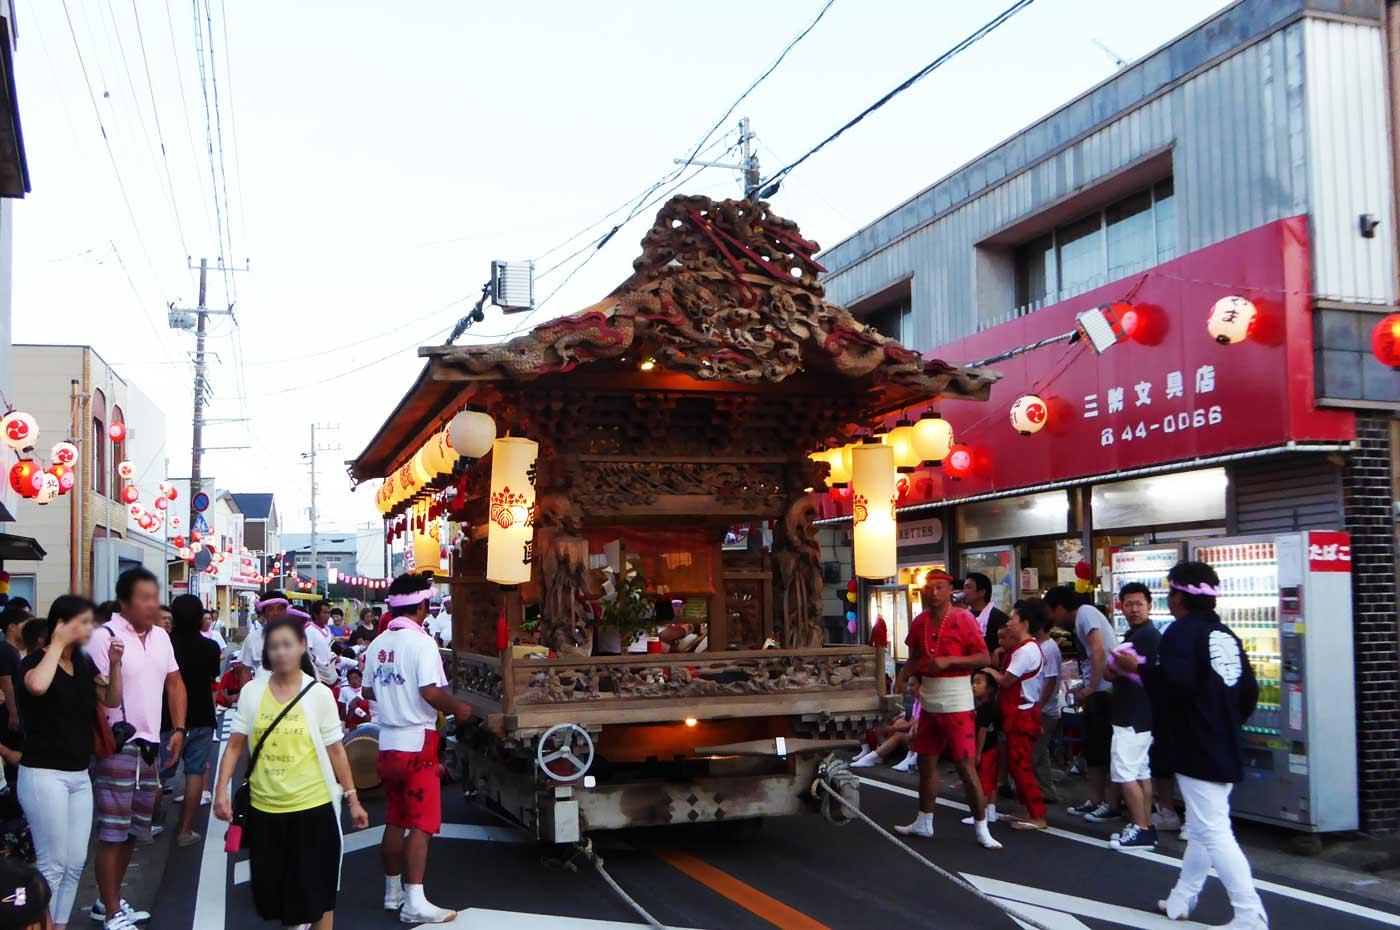 寺庭地区 千倉八幡神社の屋台